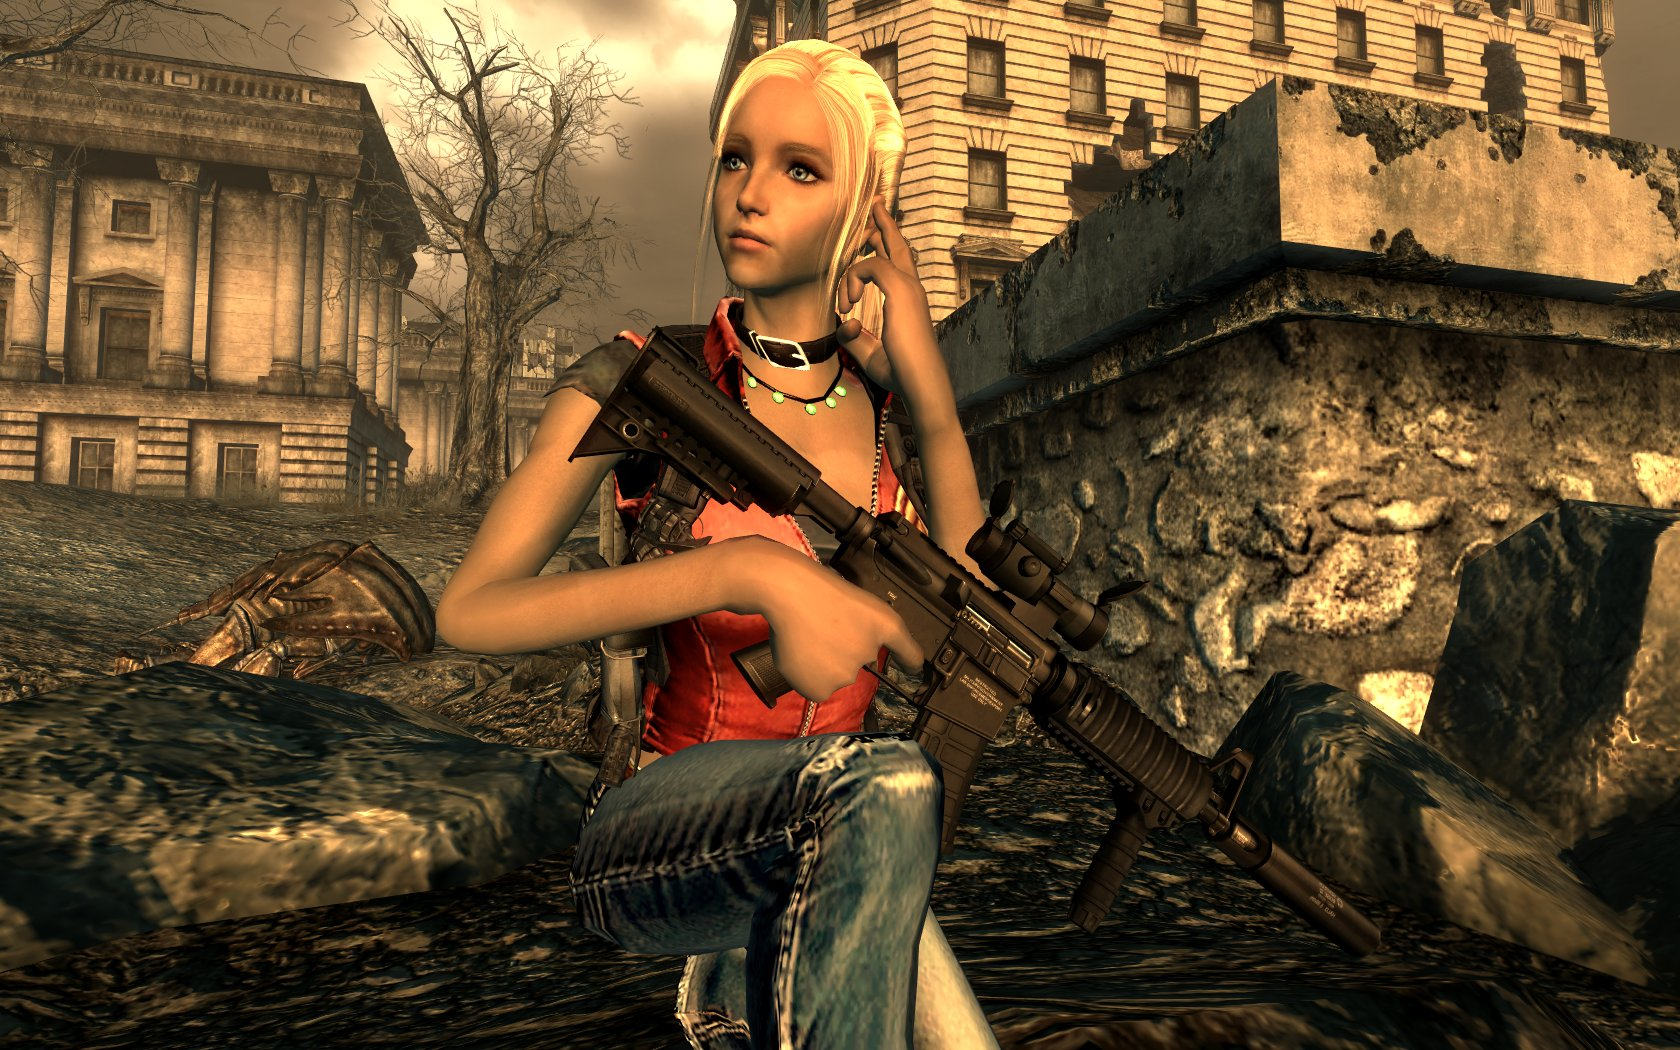 Fallout 3 hentai game erotic scenes